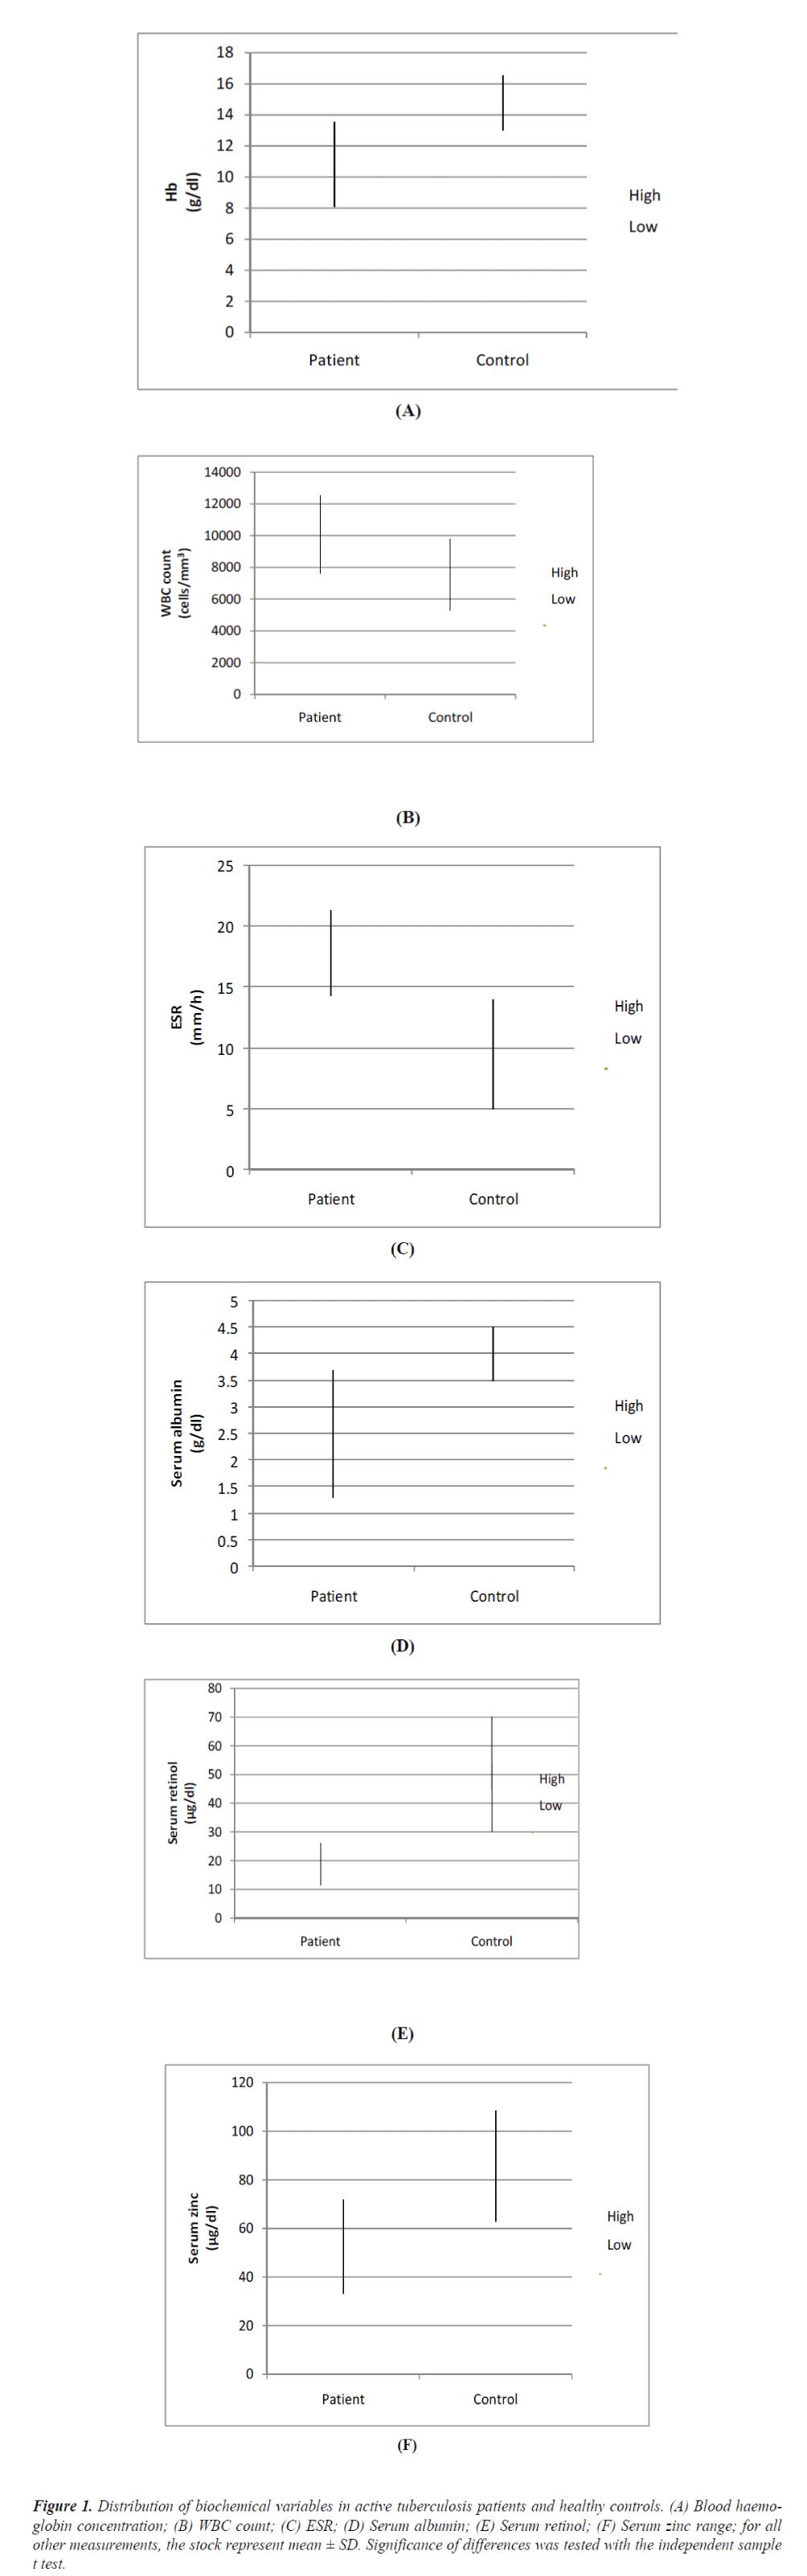 biomedres-Distribution-biochemical-variables